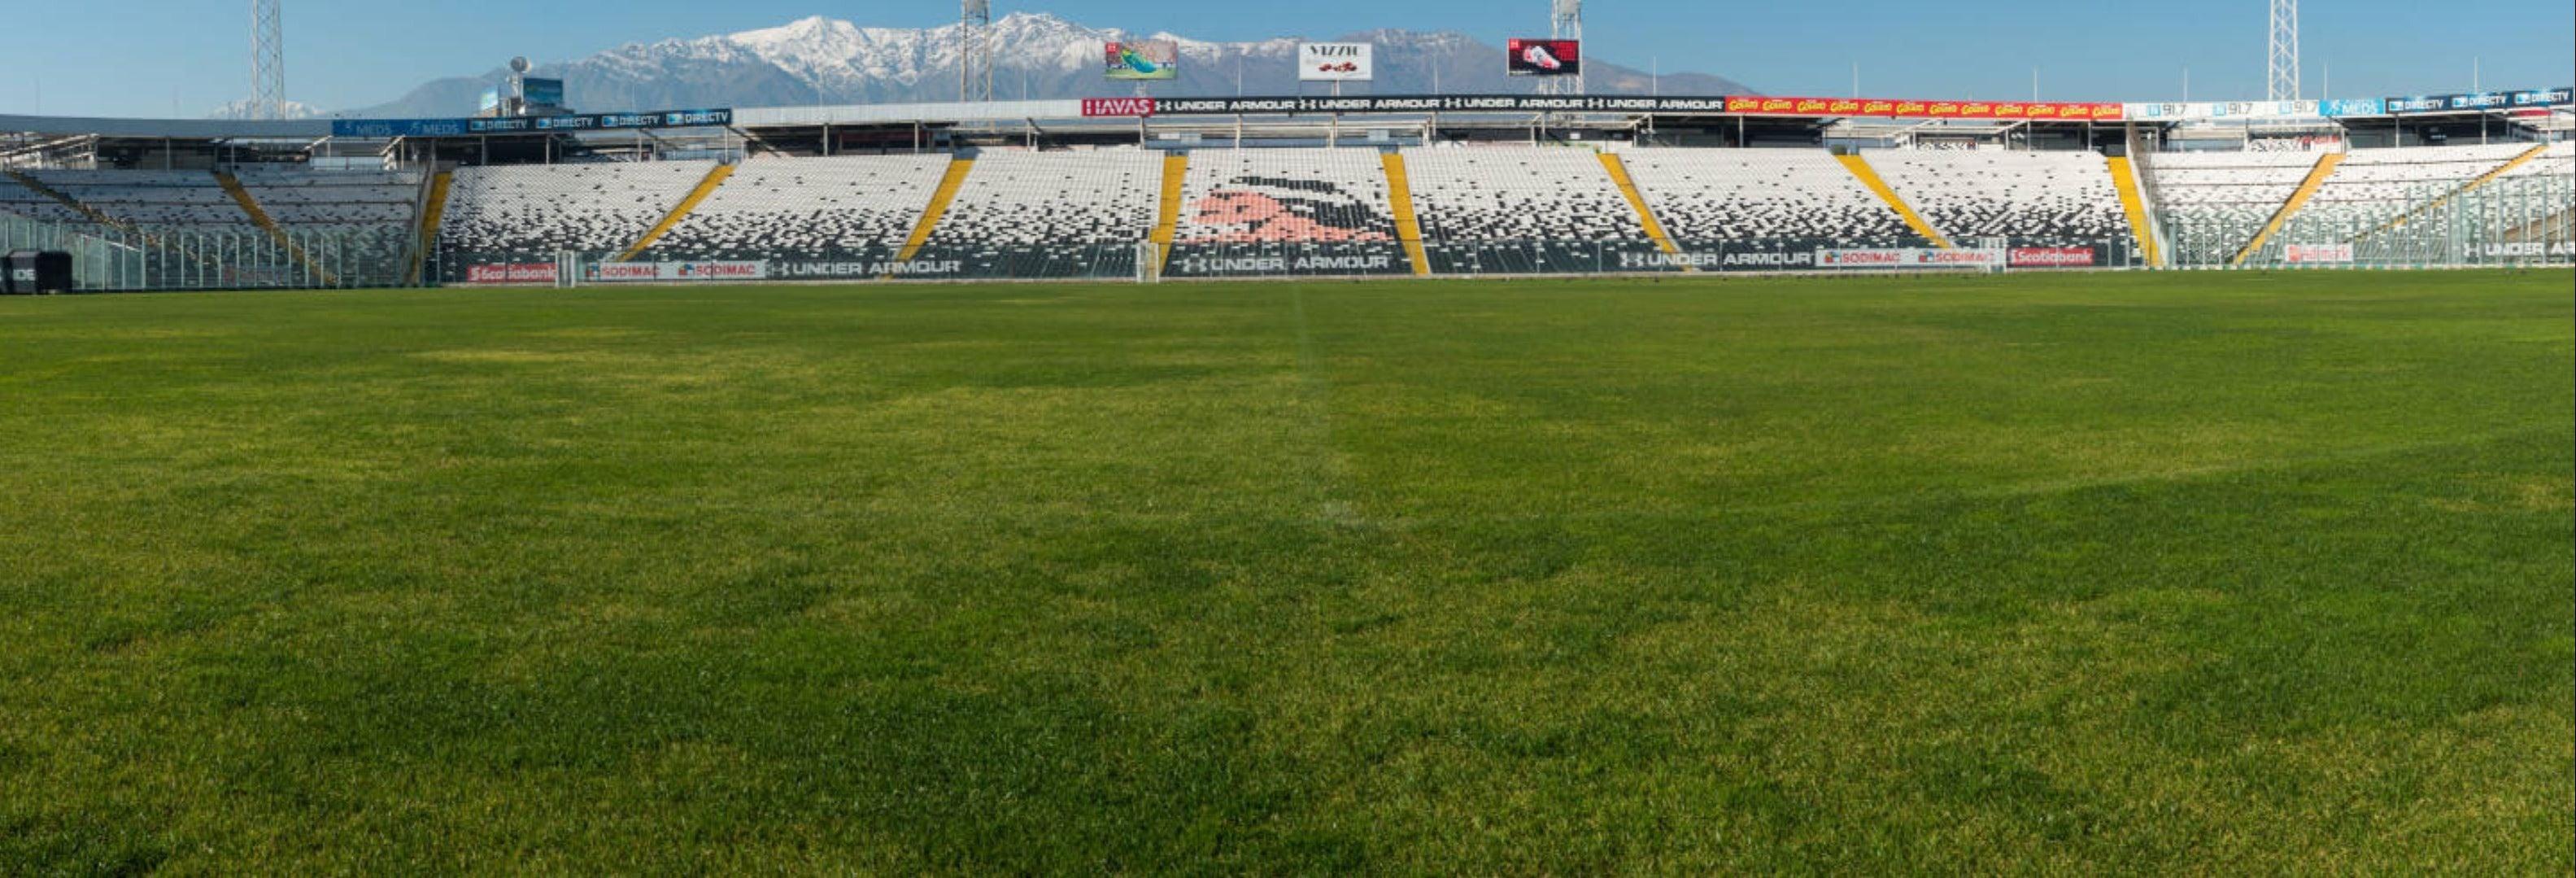 Visite du Stade Monumental